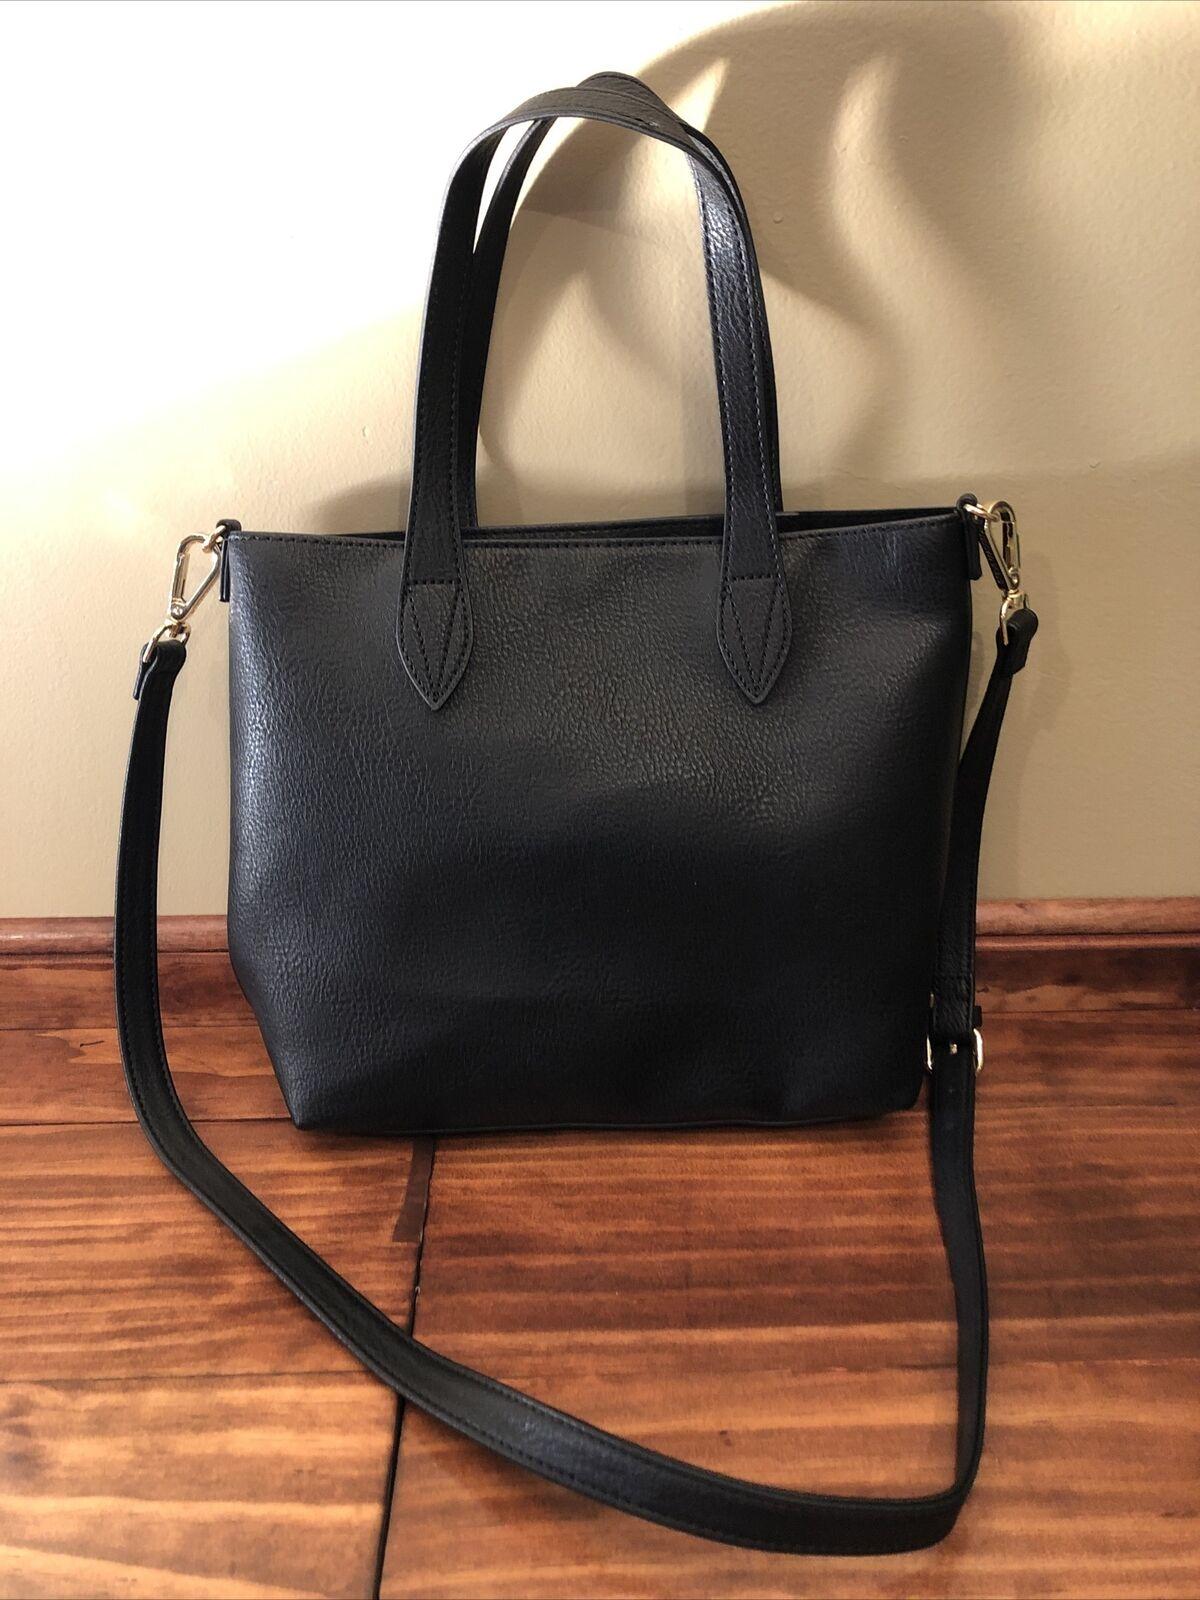 Steve Madden Black Synthetic Leather Medium Bucket Purse